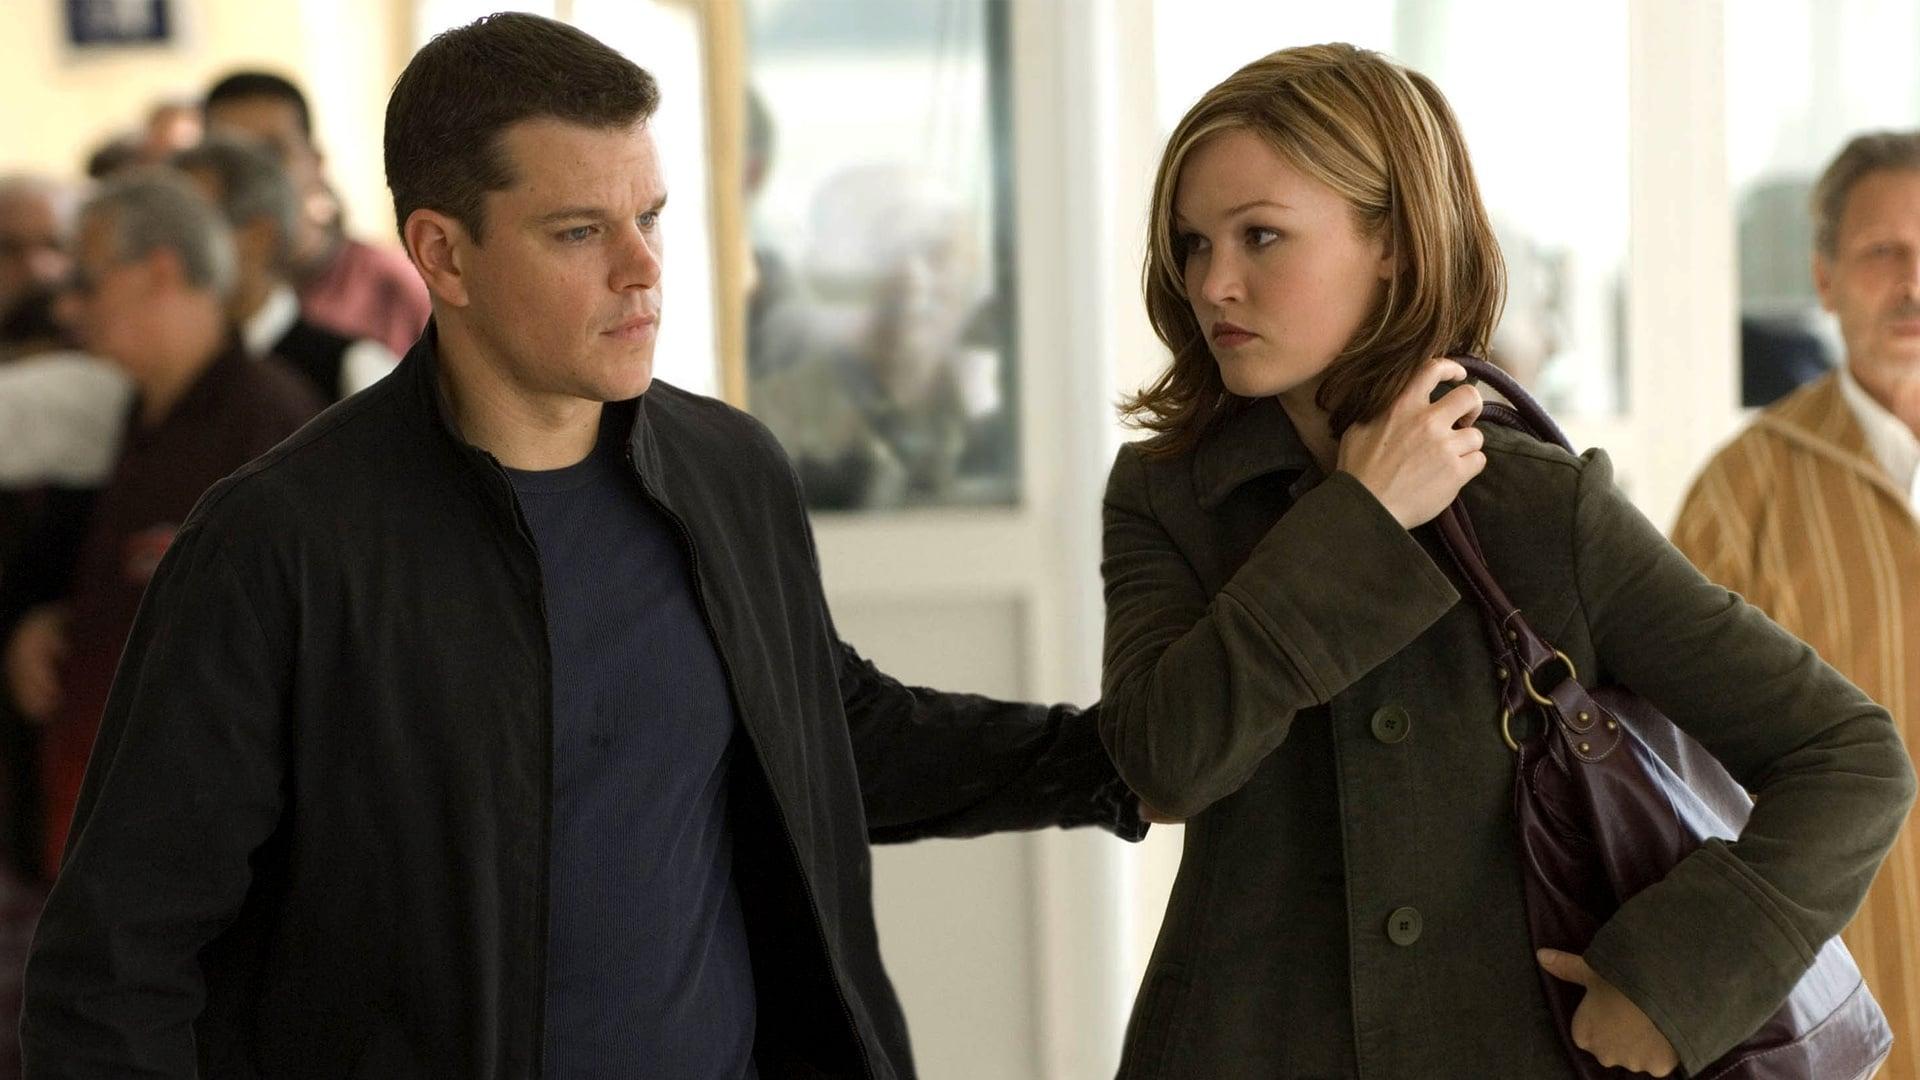 The Bourne Ultimatum - Cast and Crew